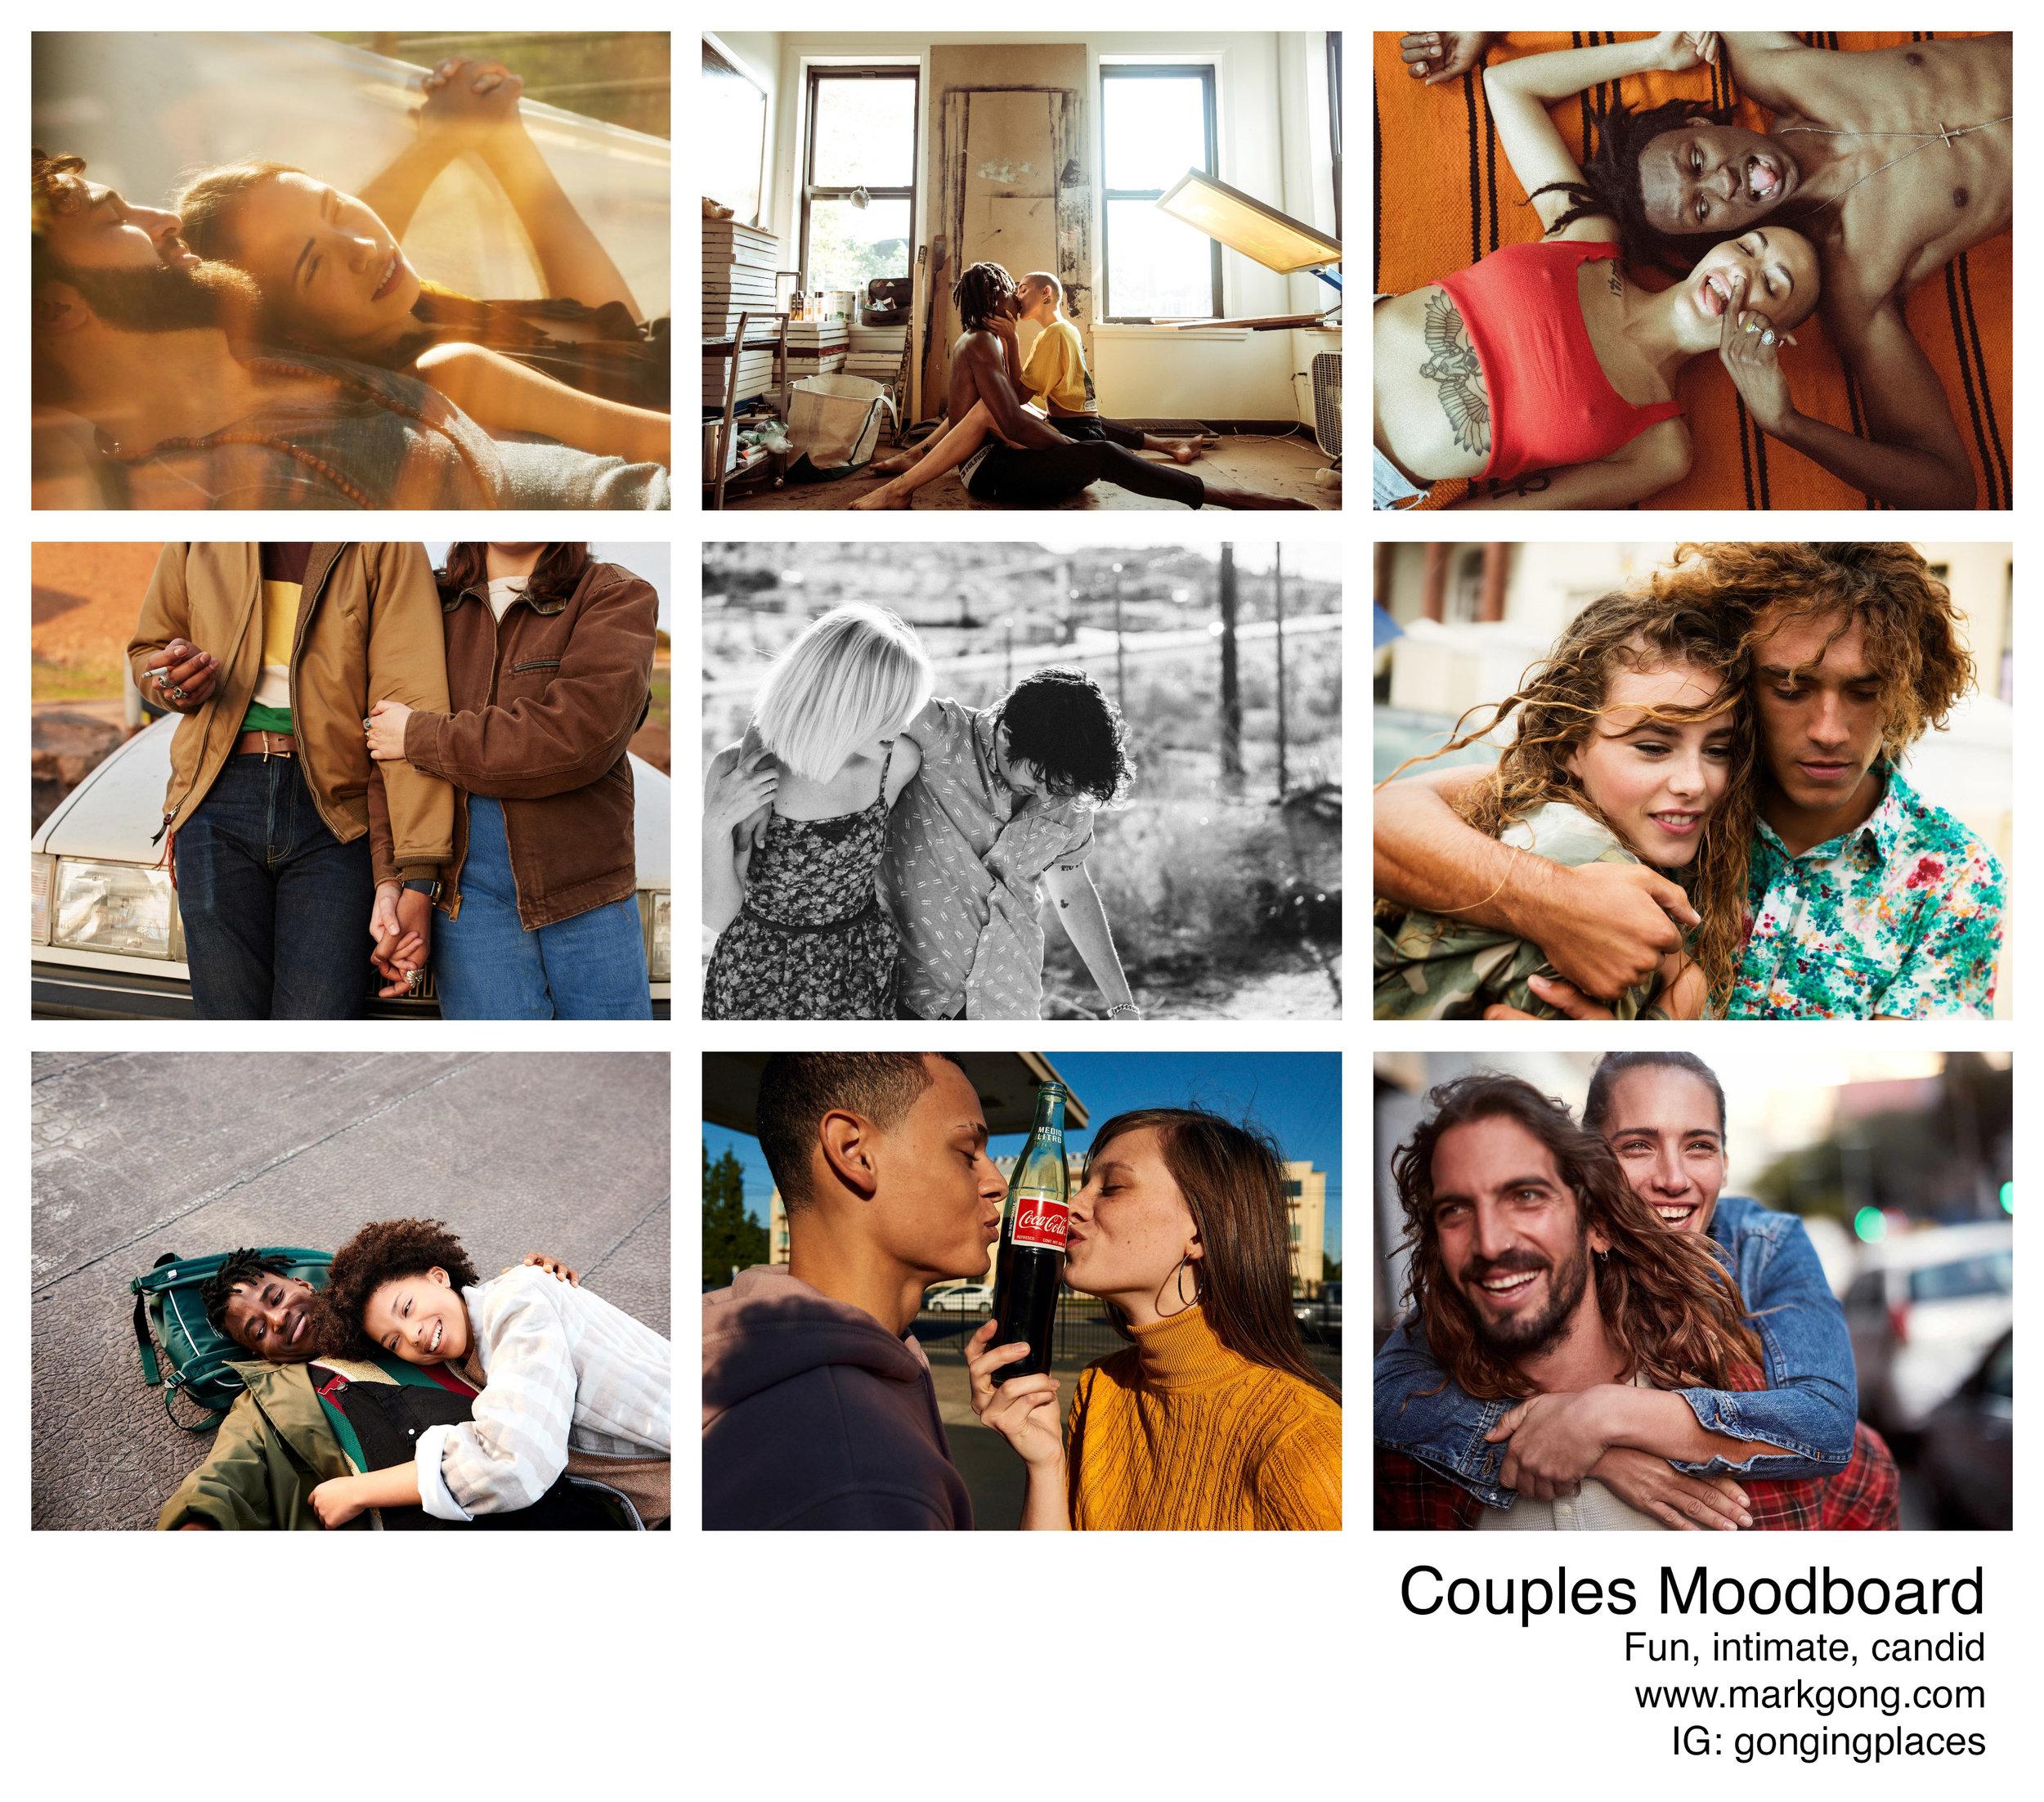 LA-Couples 1.JPG